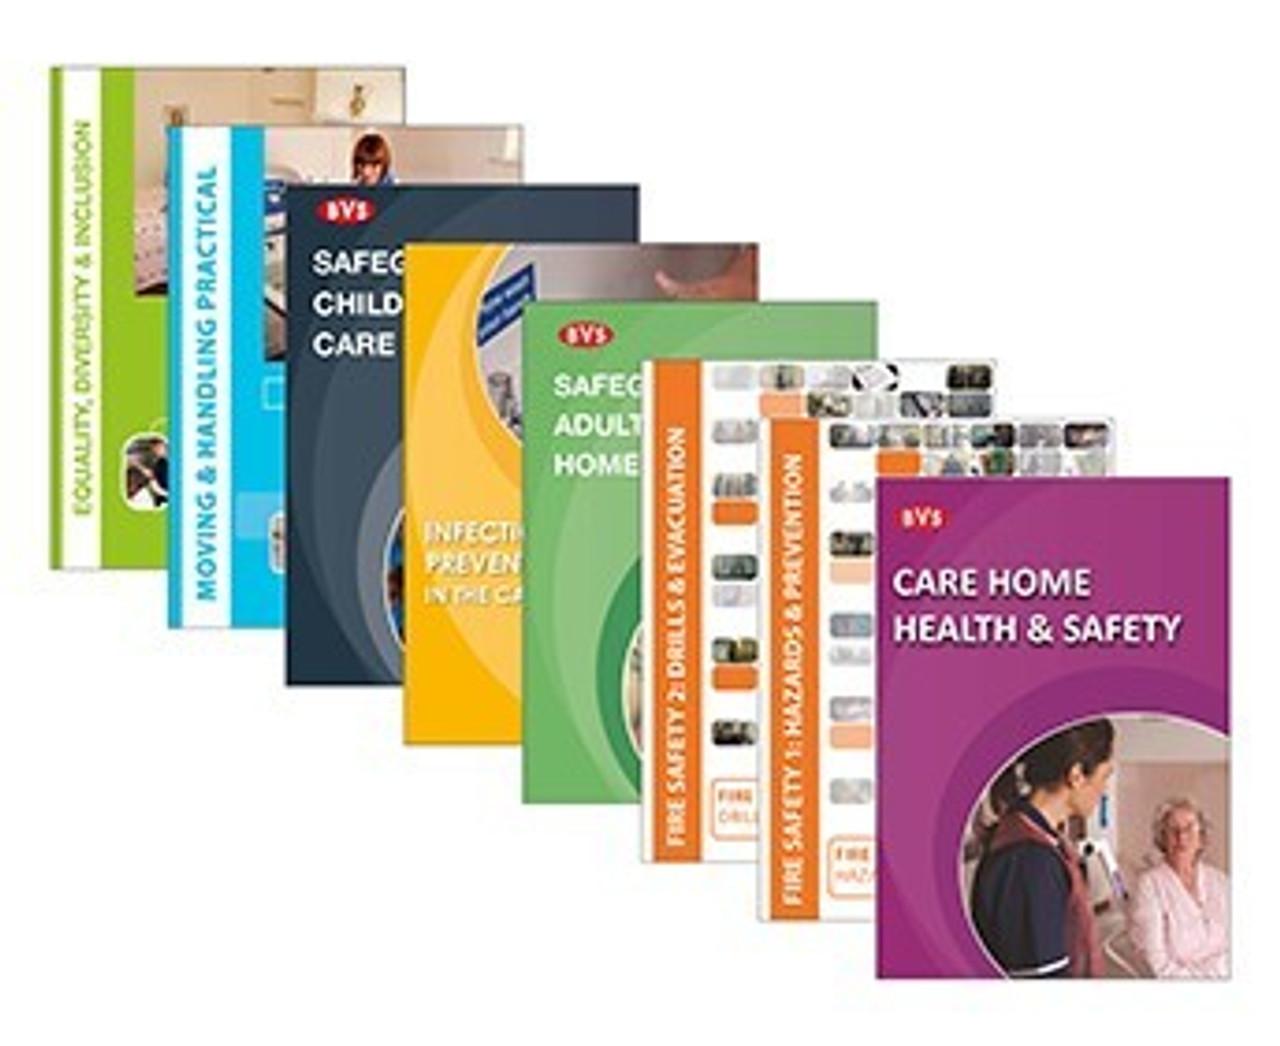 Mandatory training for care home staff